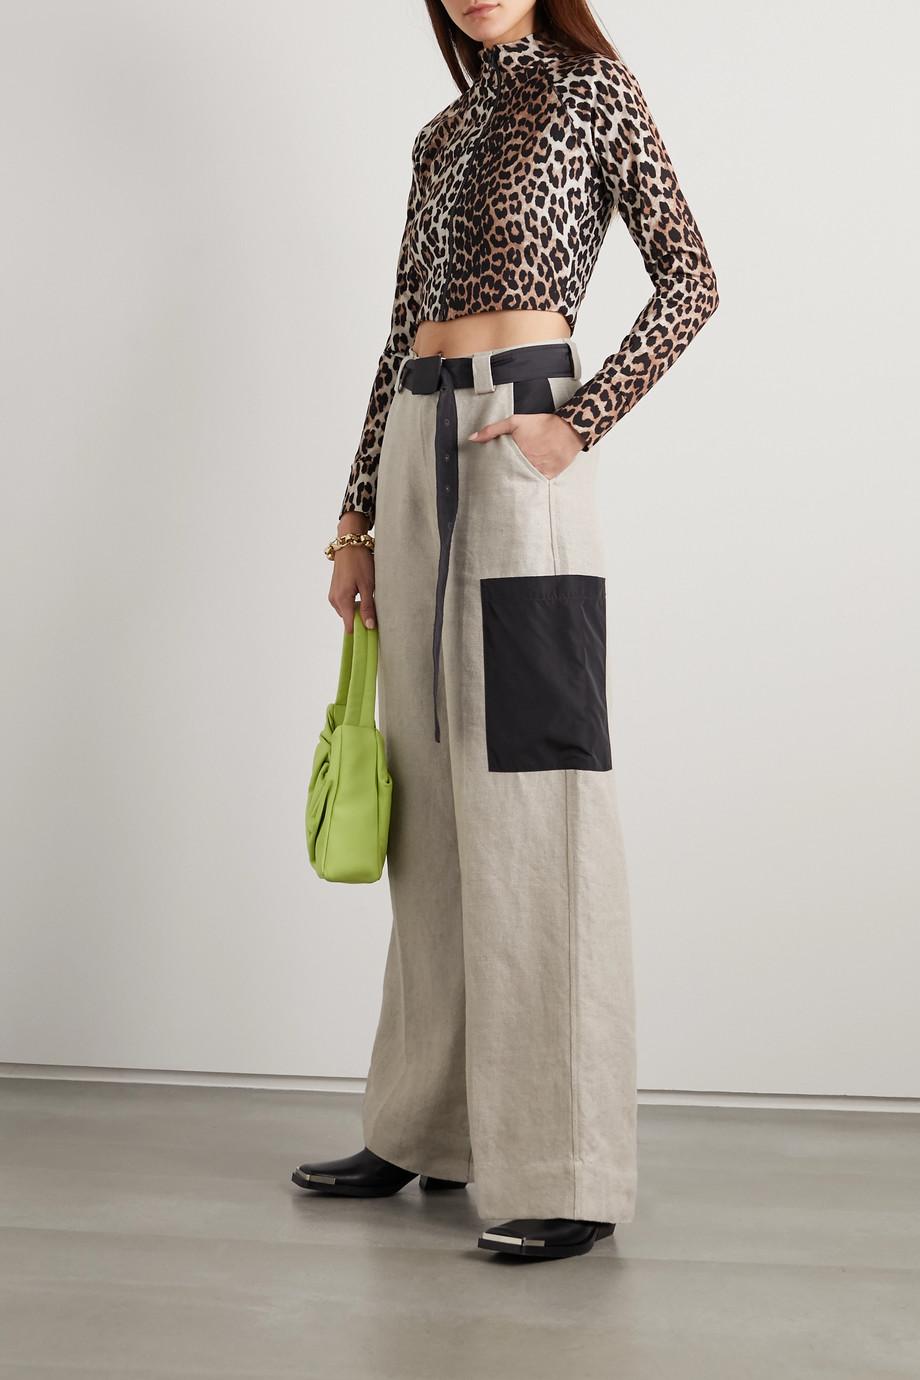 GANNI + NET SUSTAIN leopard-print bikini top